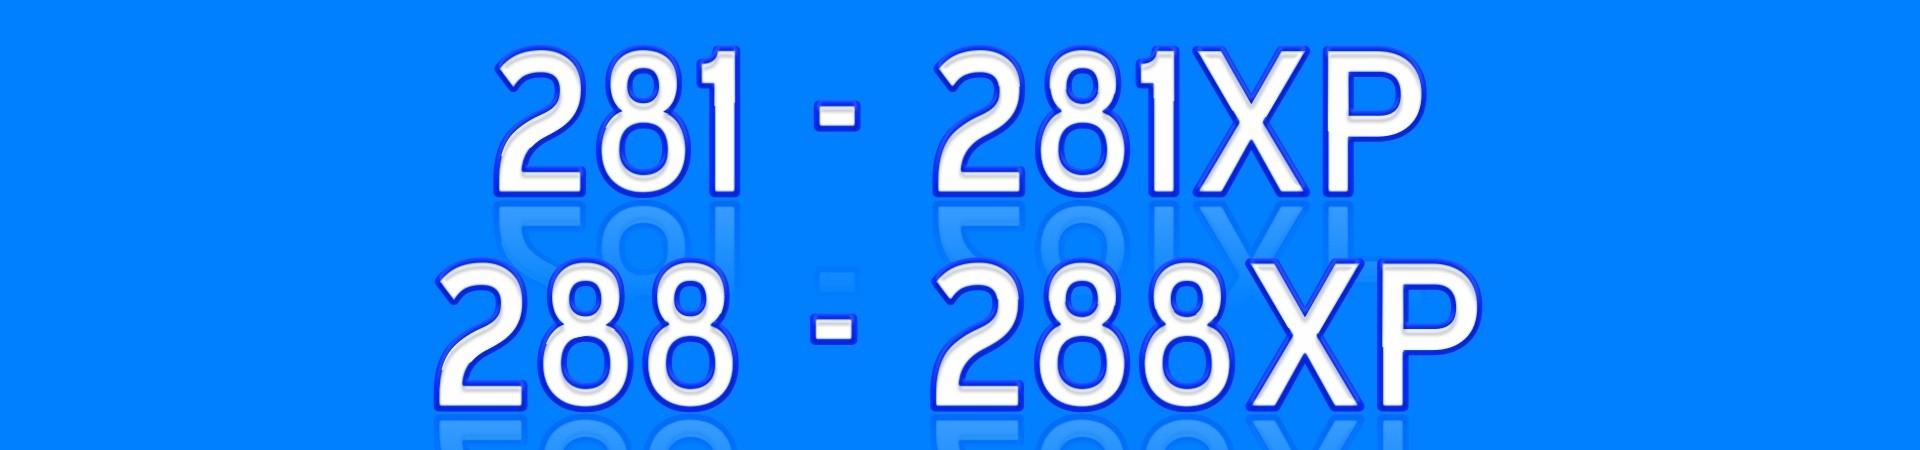 181 281 288